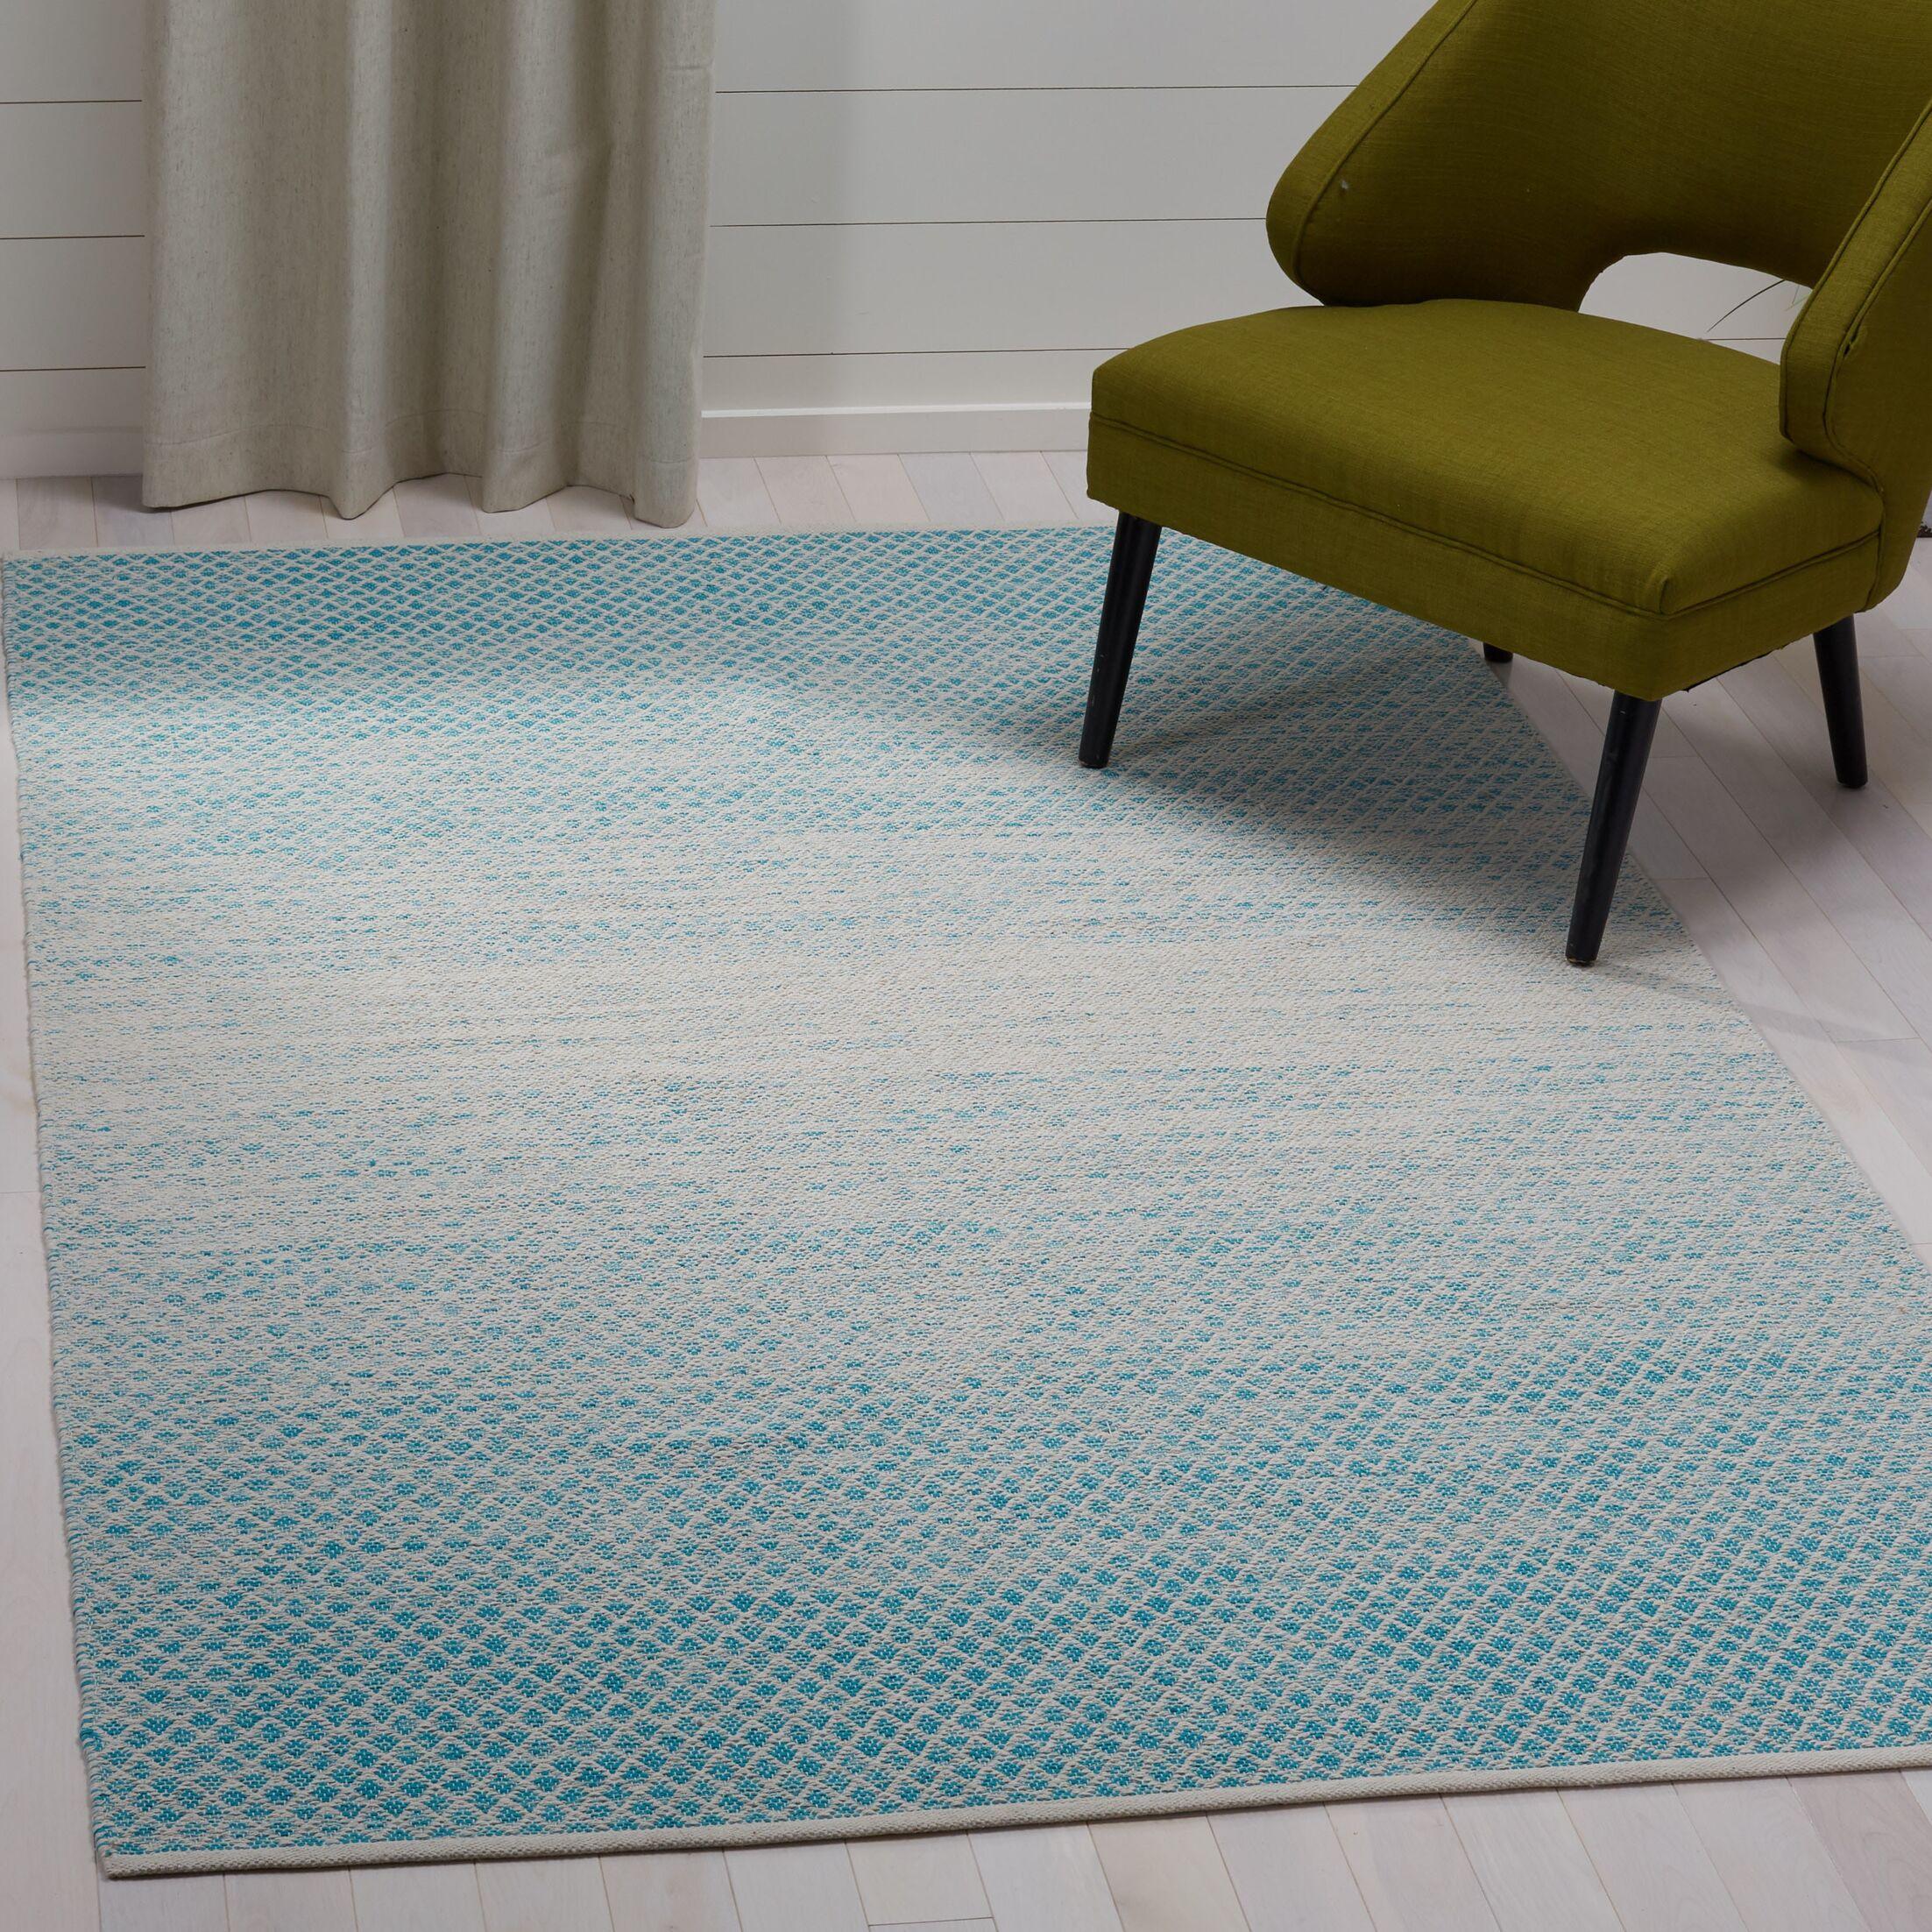 Saleem Hand-Woven Turquoise/Ivory Area Rug Rug Size: Rectangle 5' x 8'